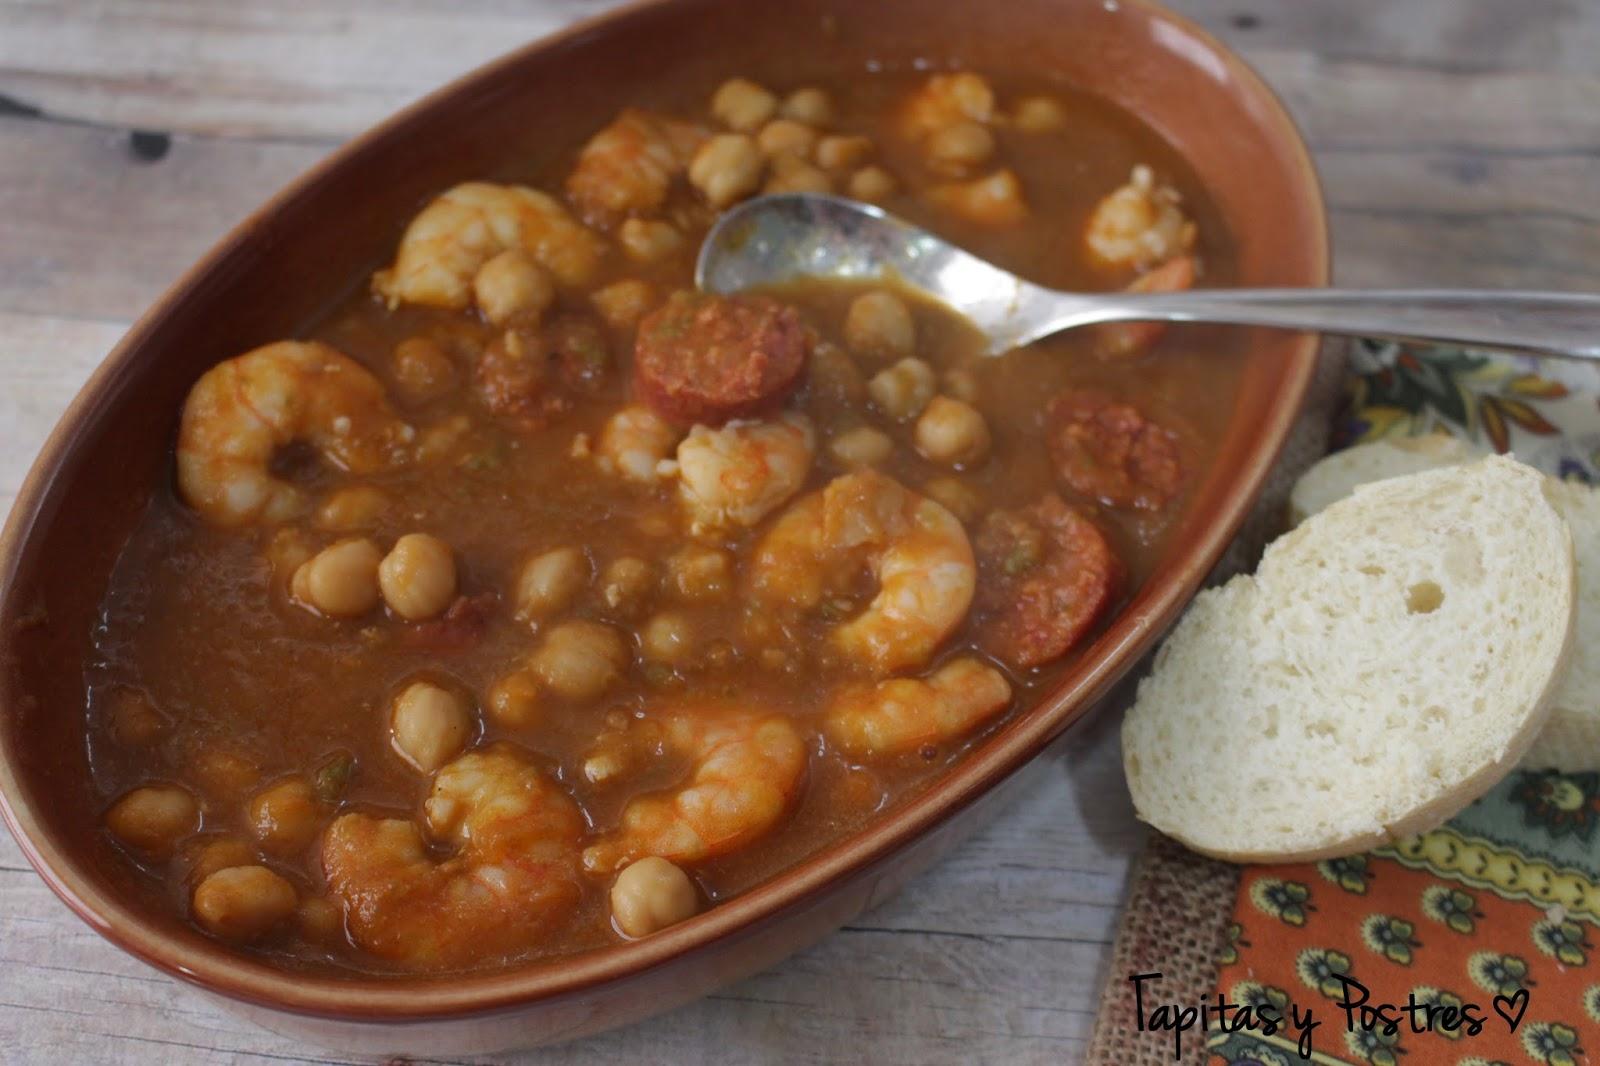 Tapitas y postres garbanzos con langostinos y chorizo for Cocinar garbanzos con chorizo